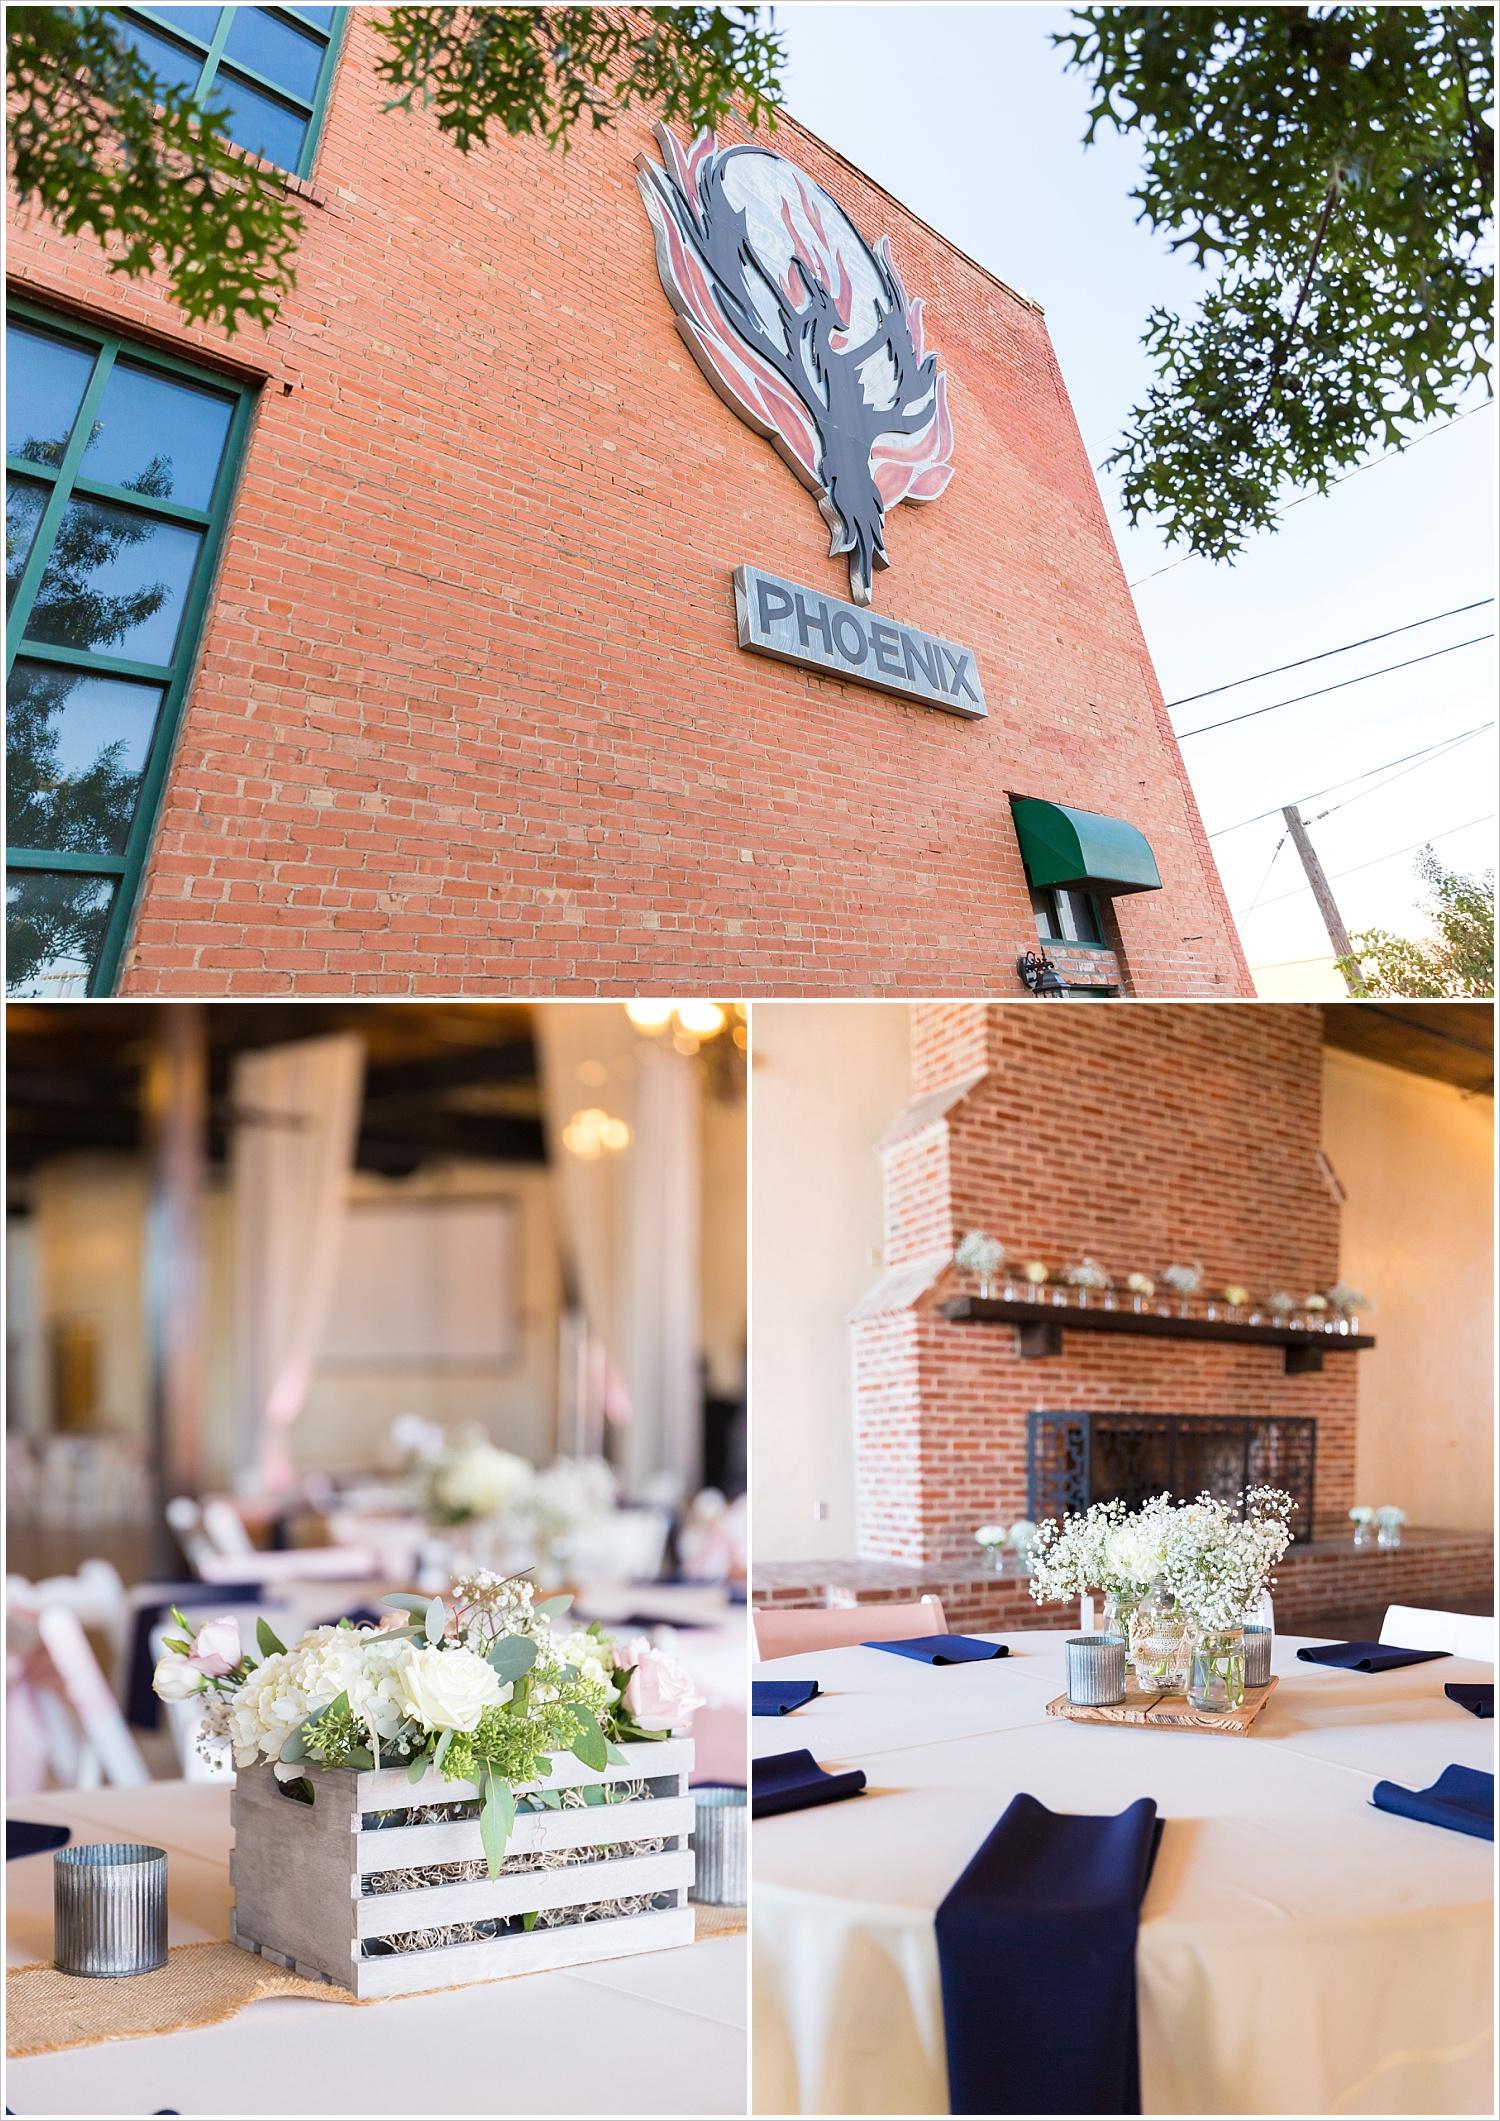 Details from navy and blush Texas Reception at The Phoenix Ballroom, Jason & Melaina Photography - www.jasonandmelaina.com